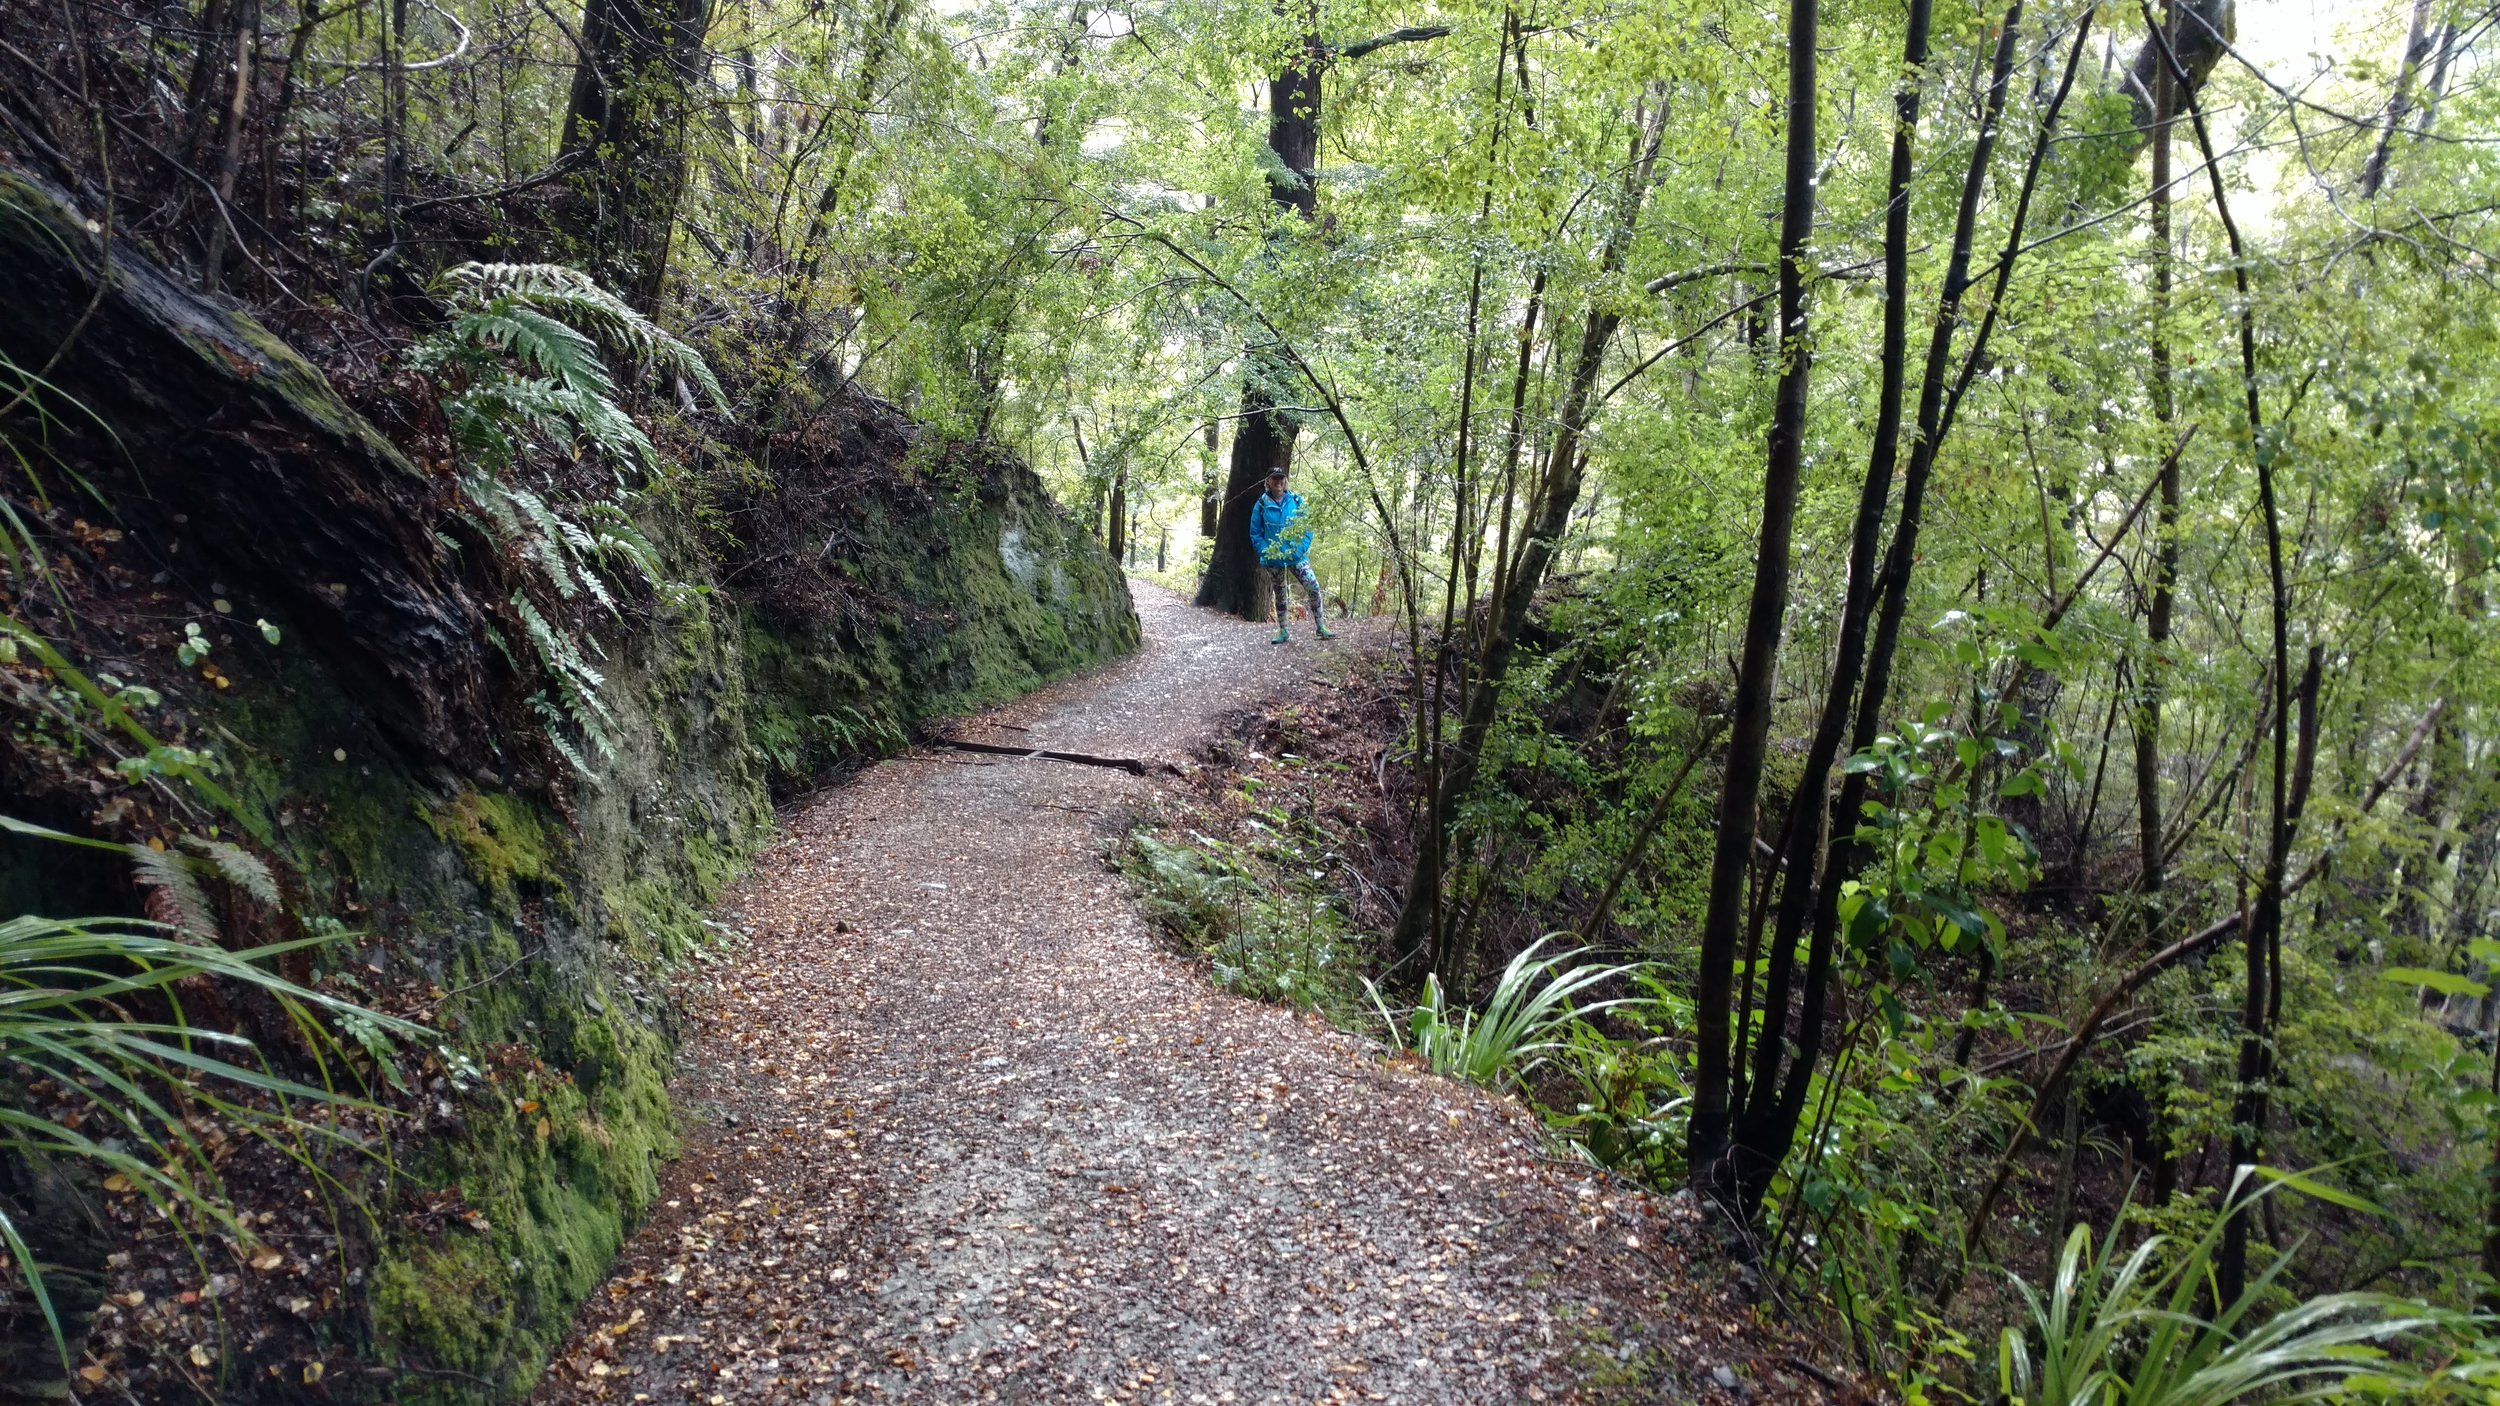 Linda hiking the loop